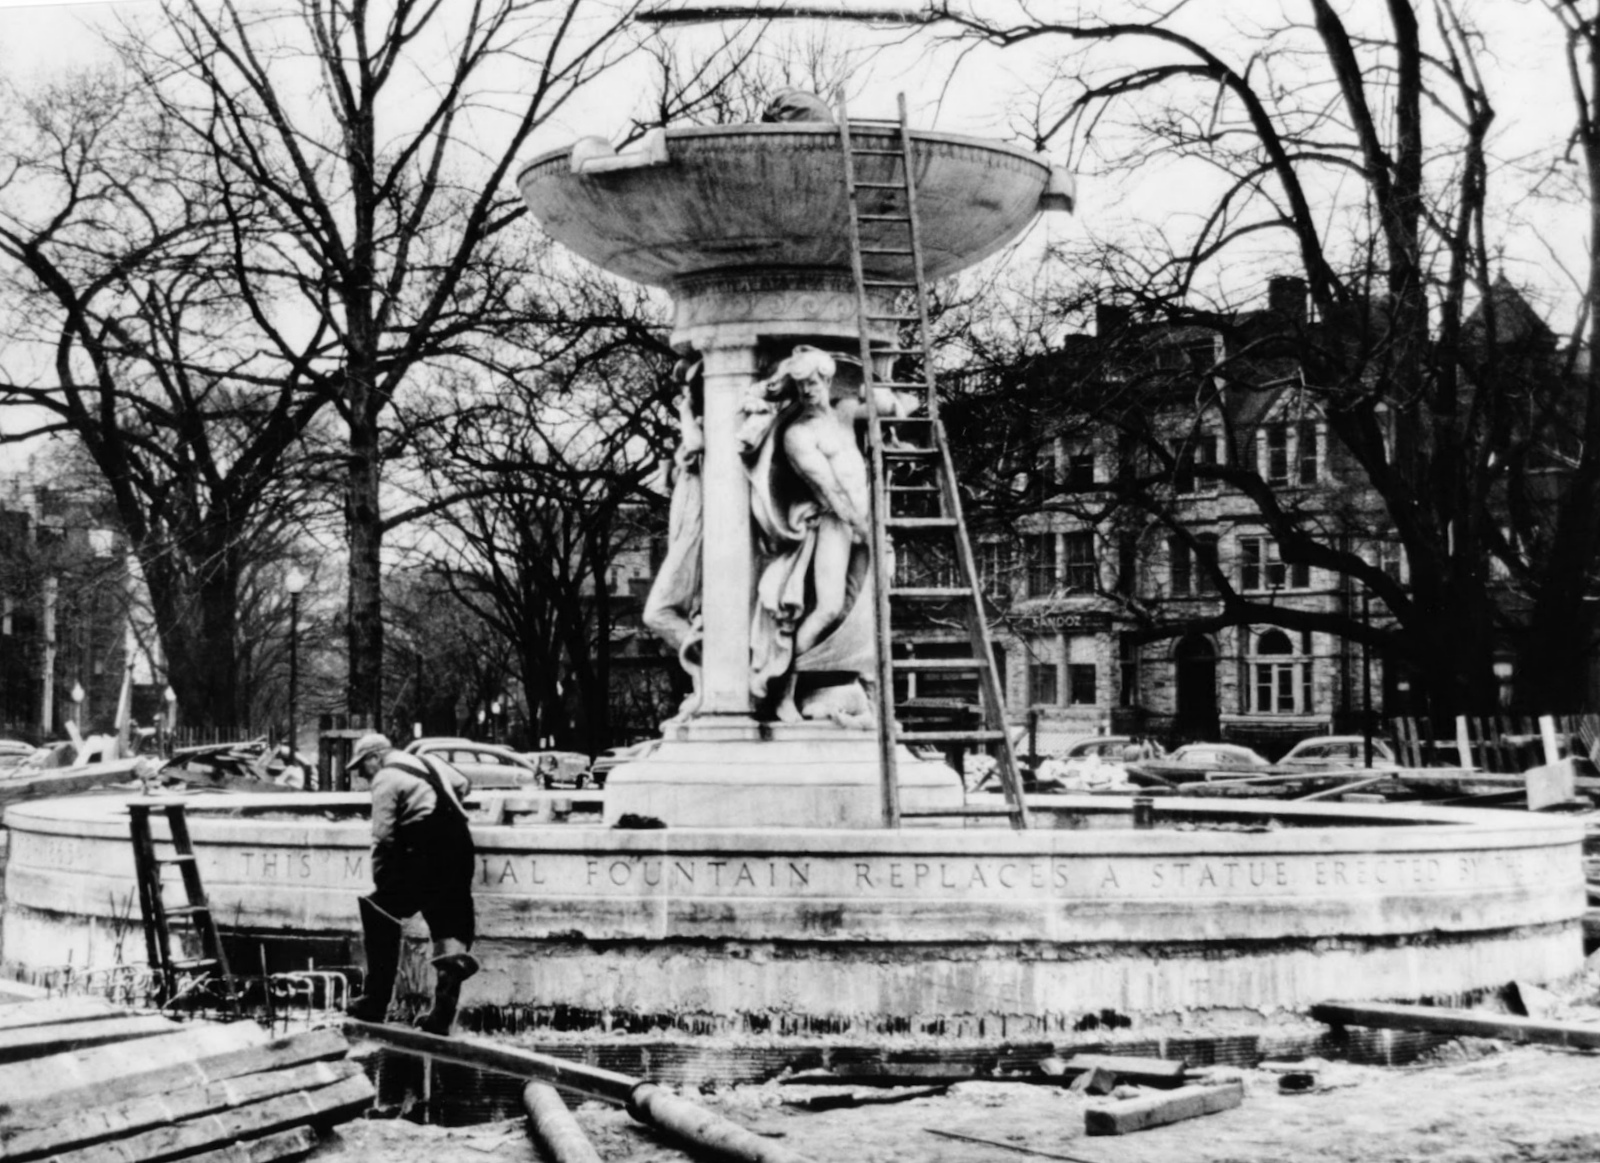 Building, Pedestal, Tree, Statue